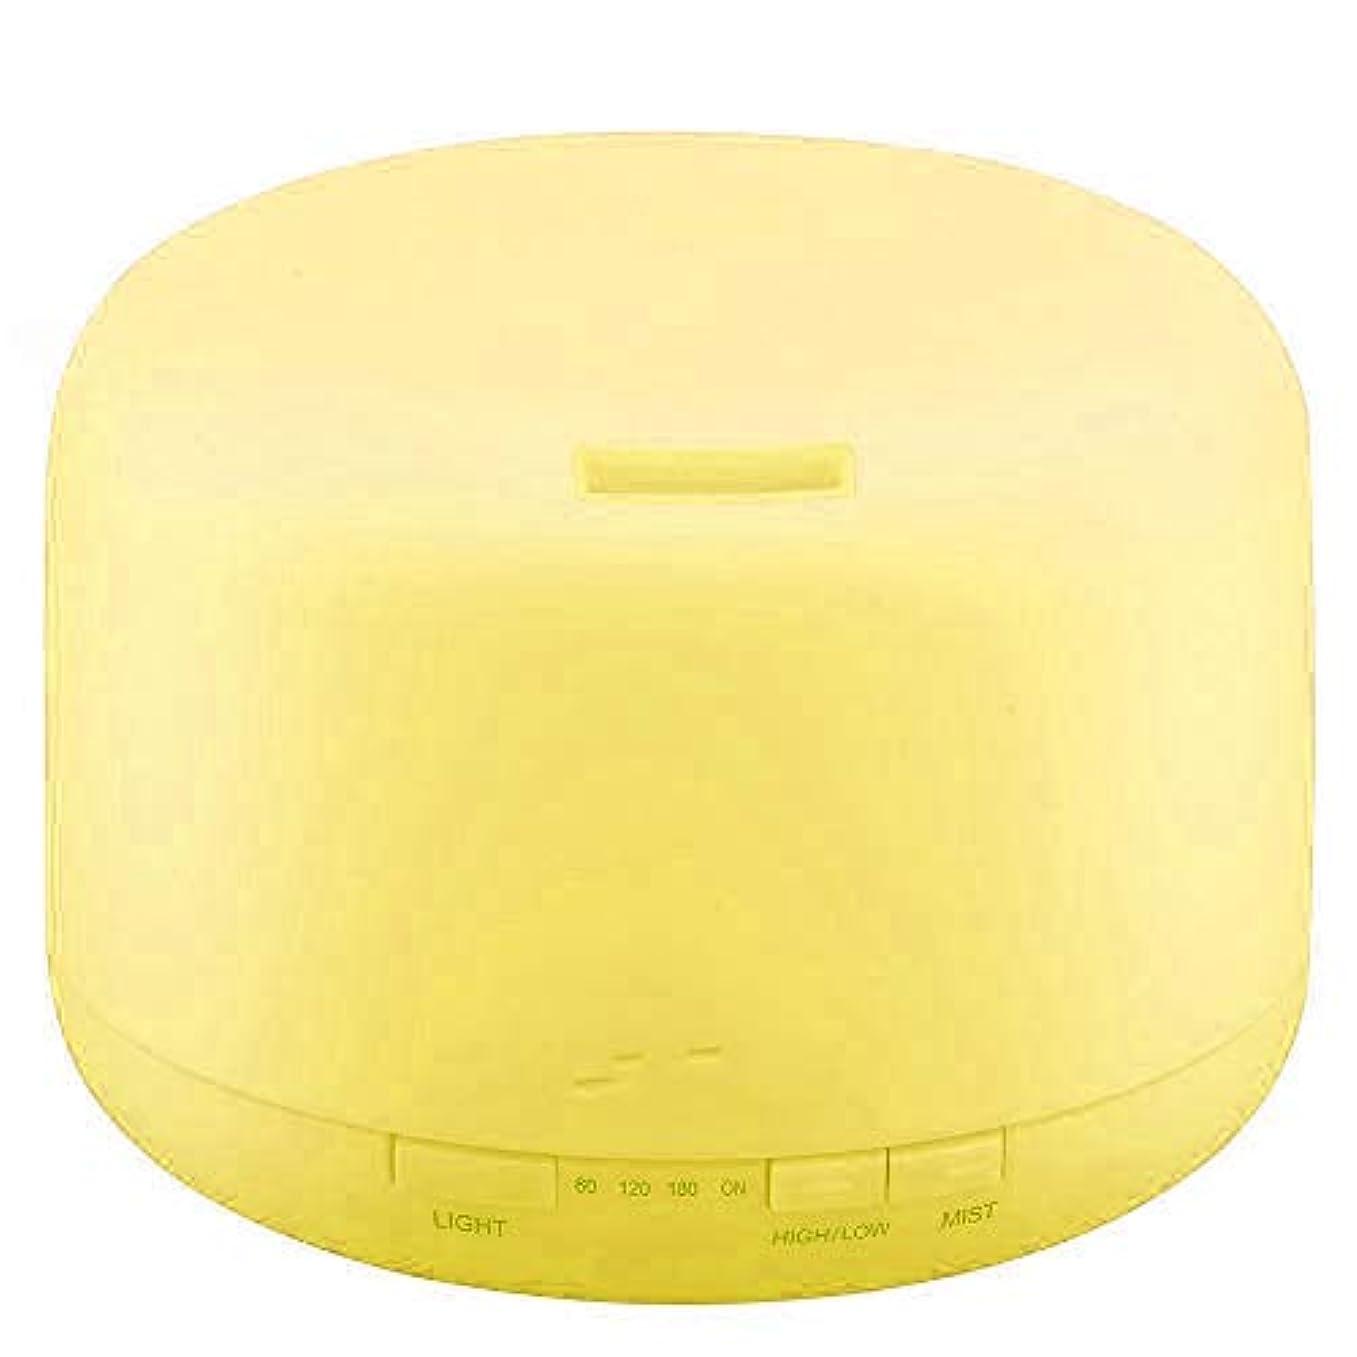 URPOWER 300 ml Aromatherapy Essential Oil Diffuser with 4タイマー設定とWaterless自動遮断 300ml OD13